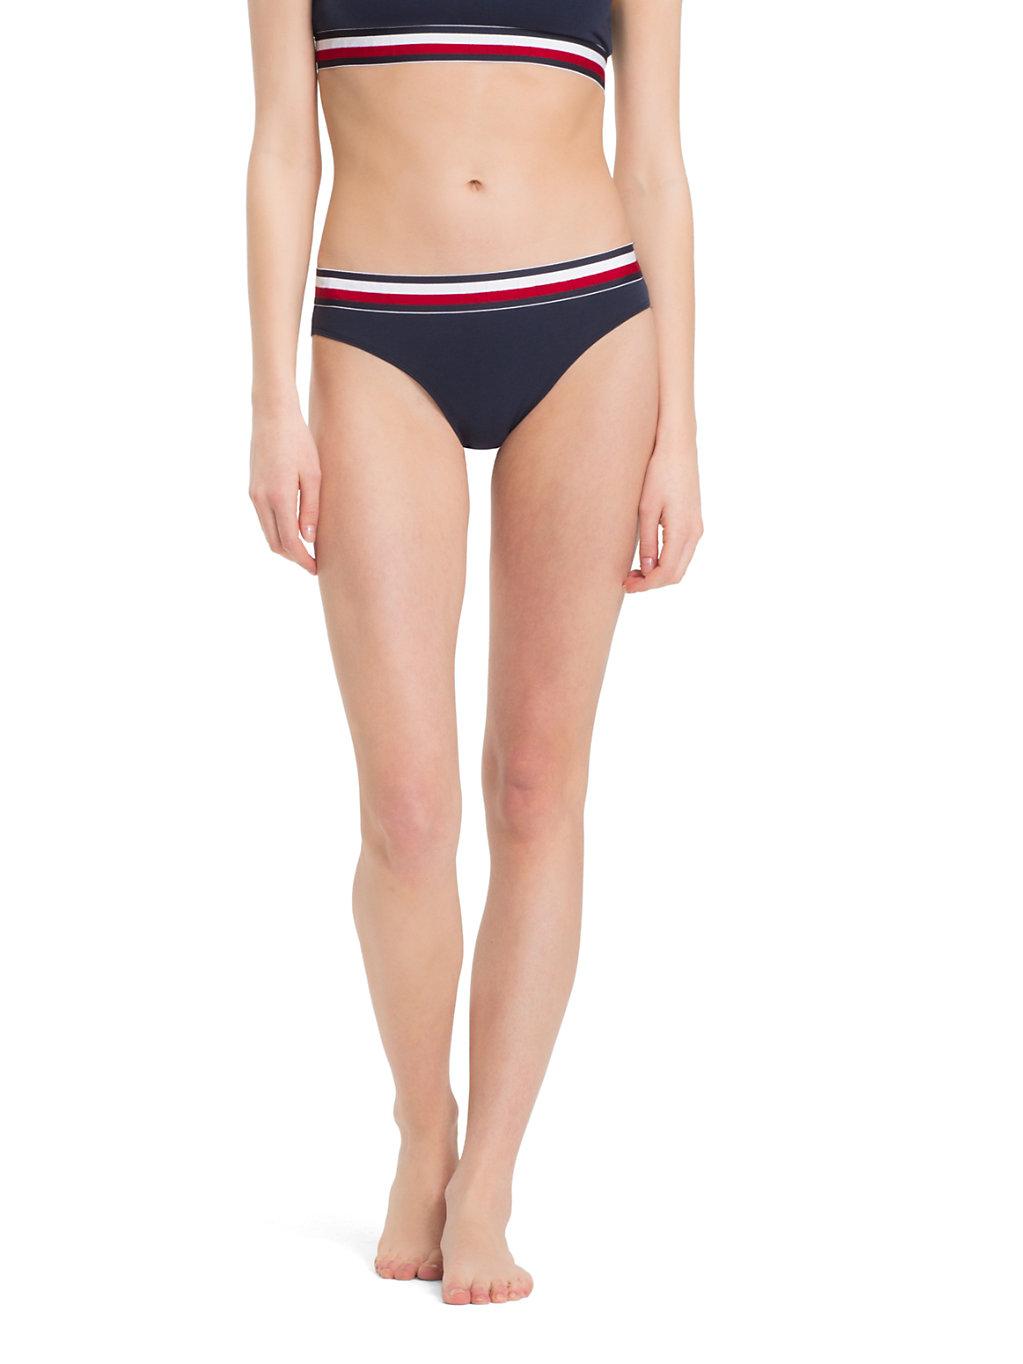 Tommy Hilfiger - Unterhose im Bikini-Look - 1